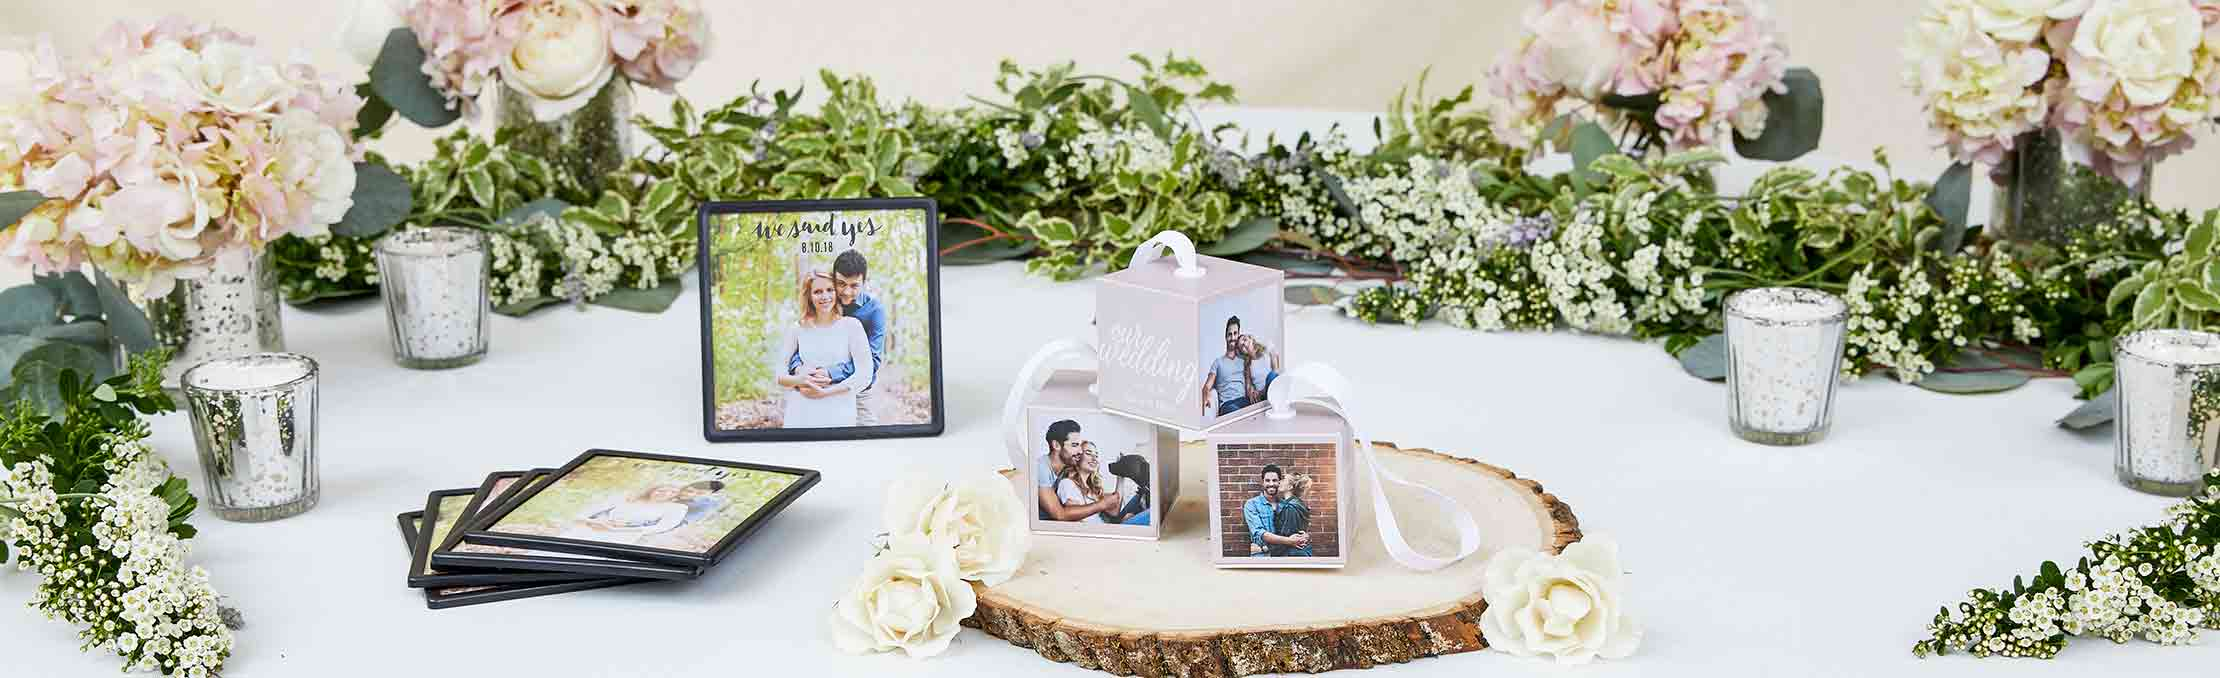 Ideas for Wedding Party Favors | Walgreens Photo Blog - Walgreens Photo